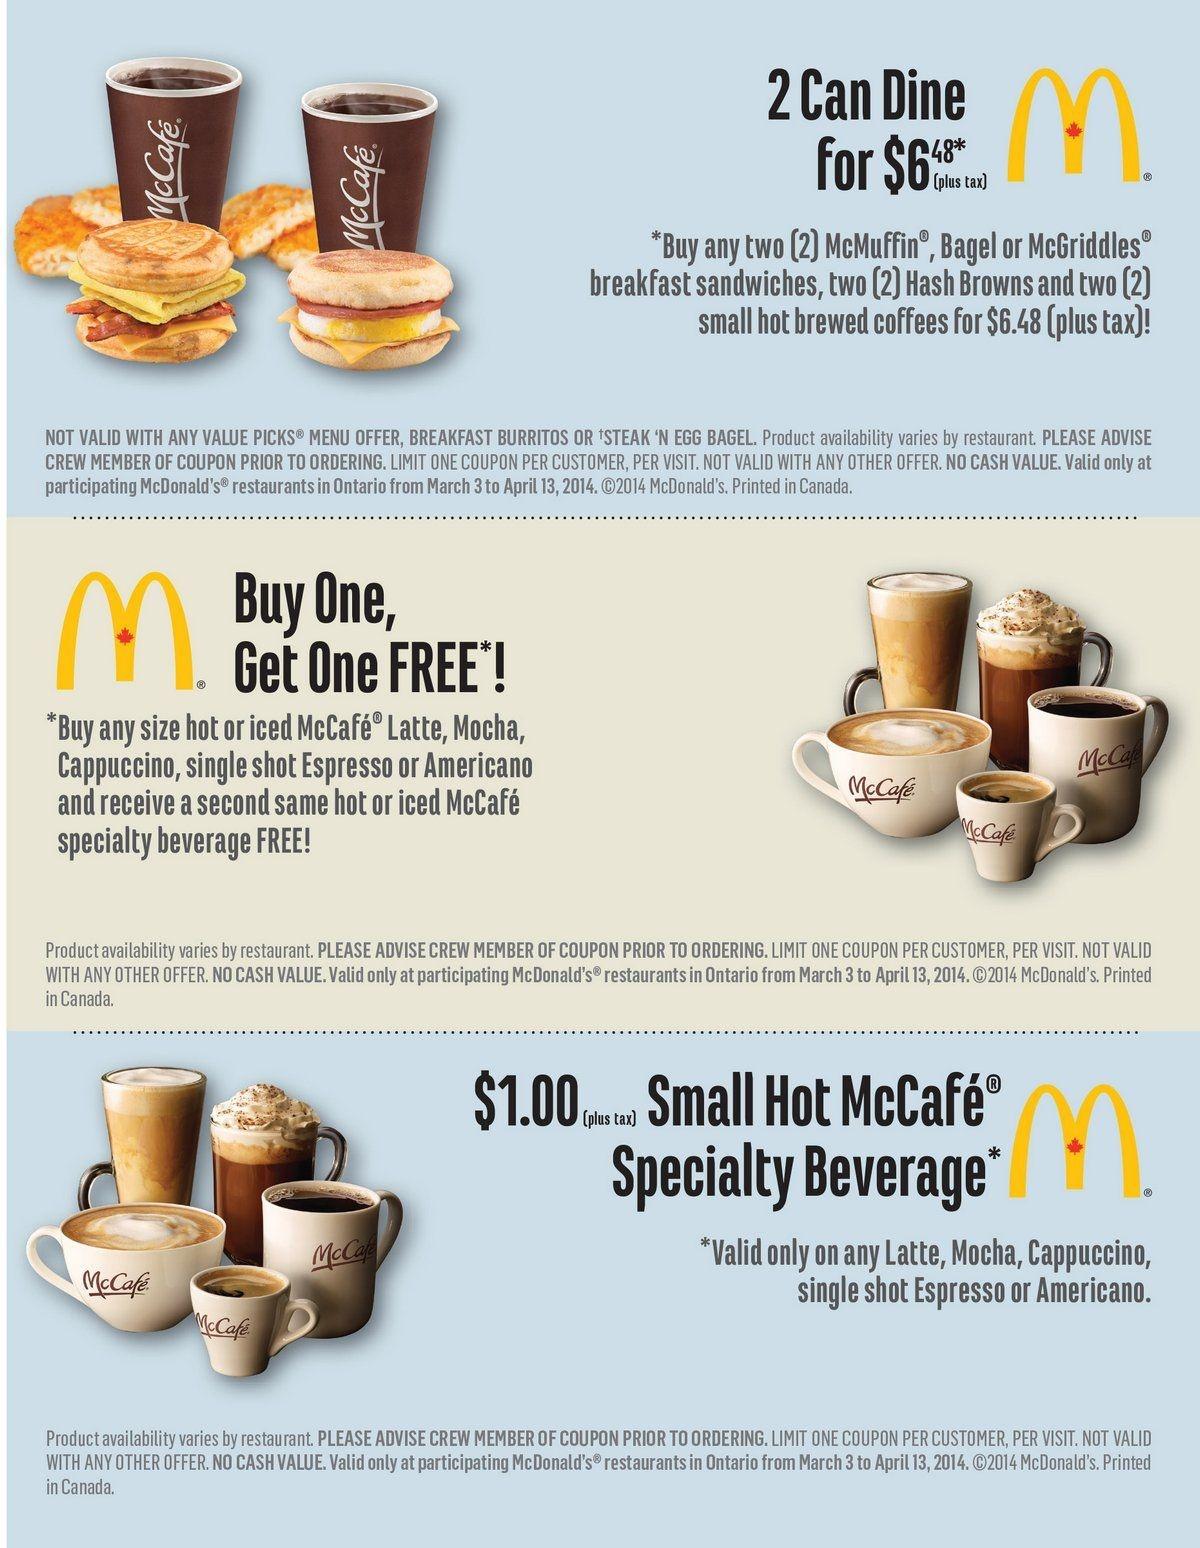 Mcdonald's Coupons March 3 - April 13 2014 Toronto | Disney - Free Mcdonalds Smoothie Printable Coupon